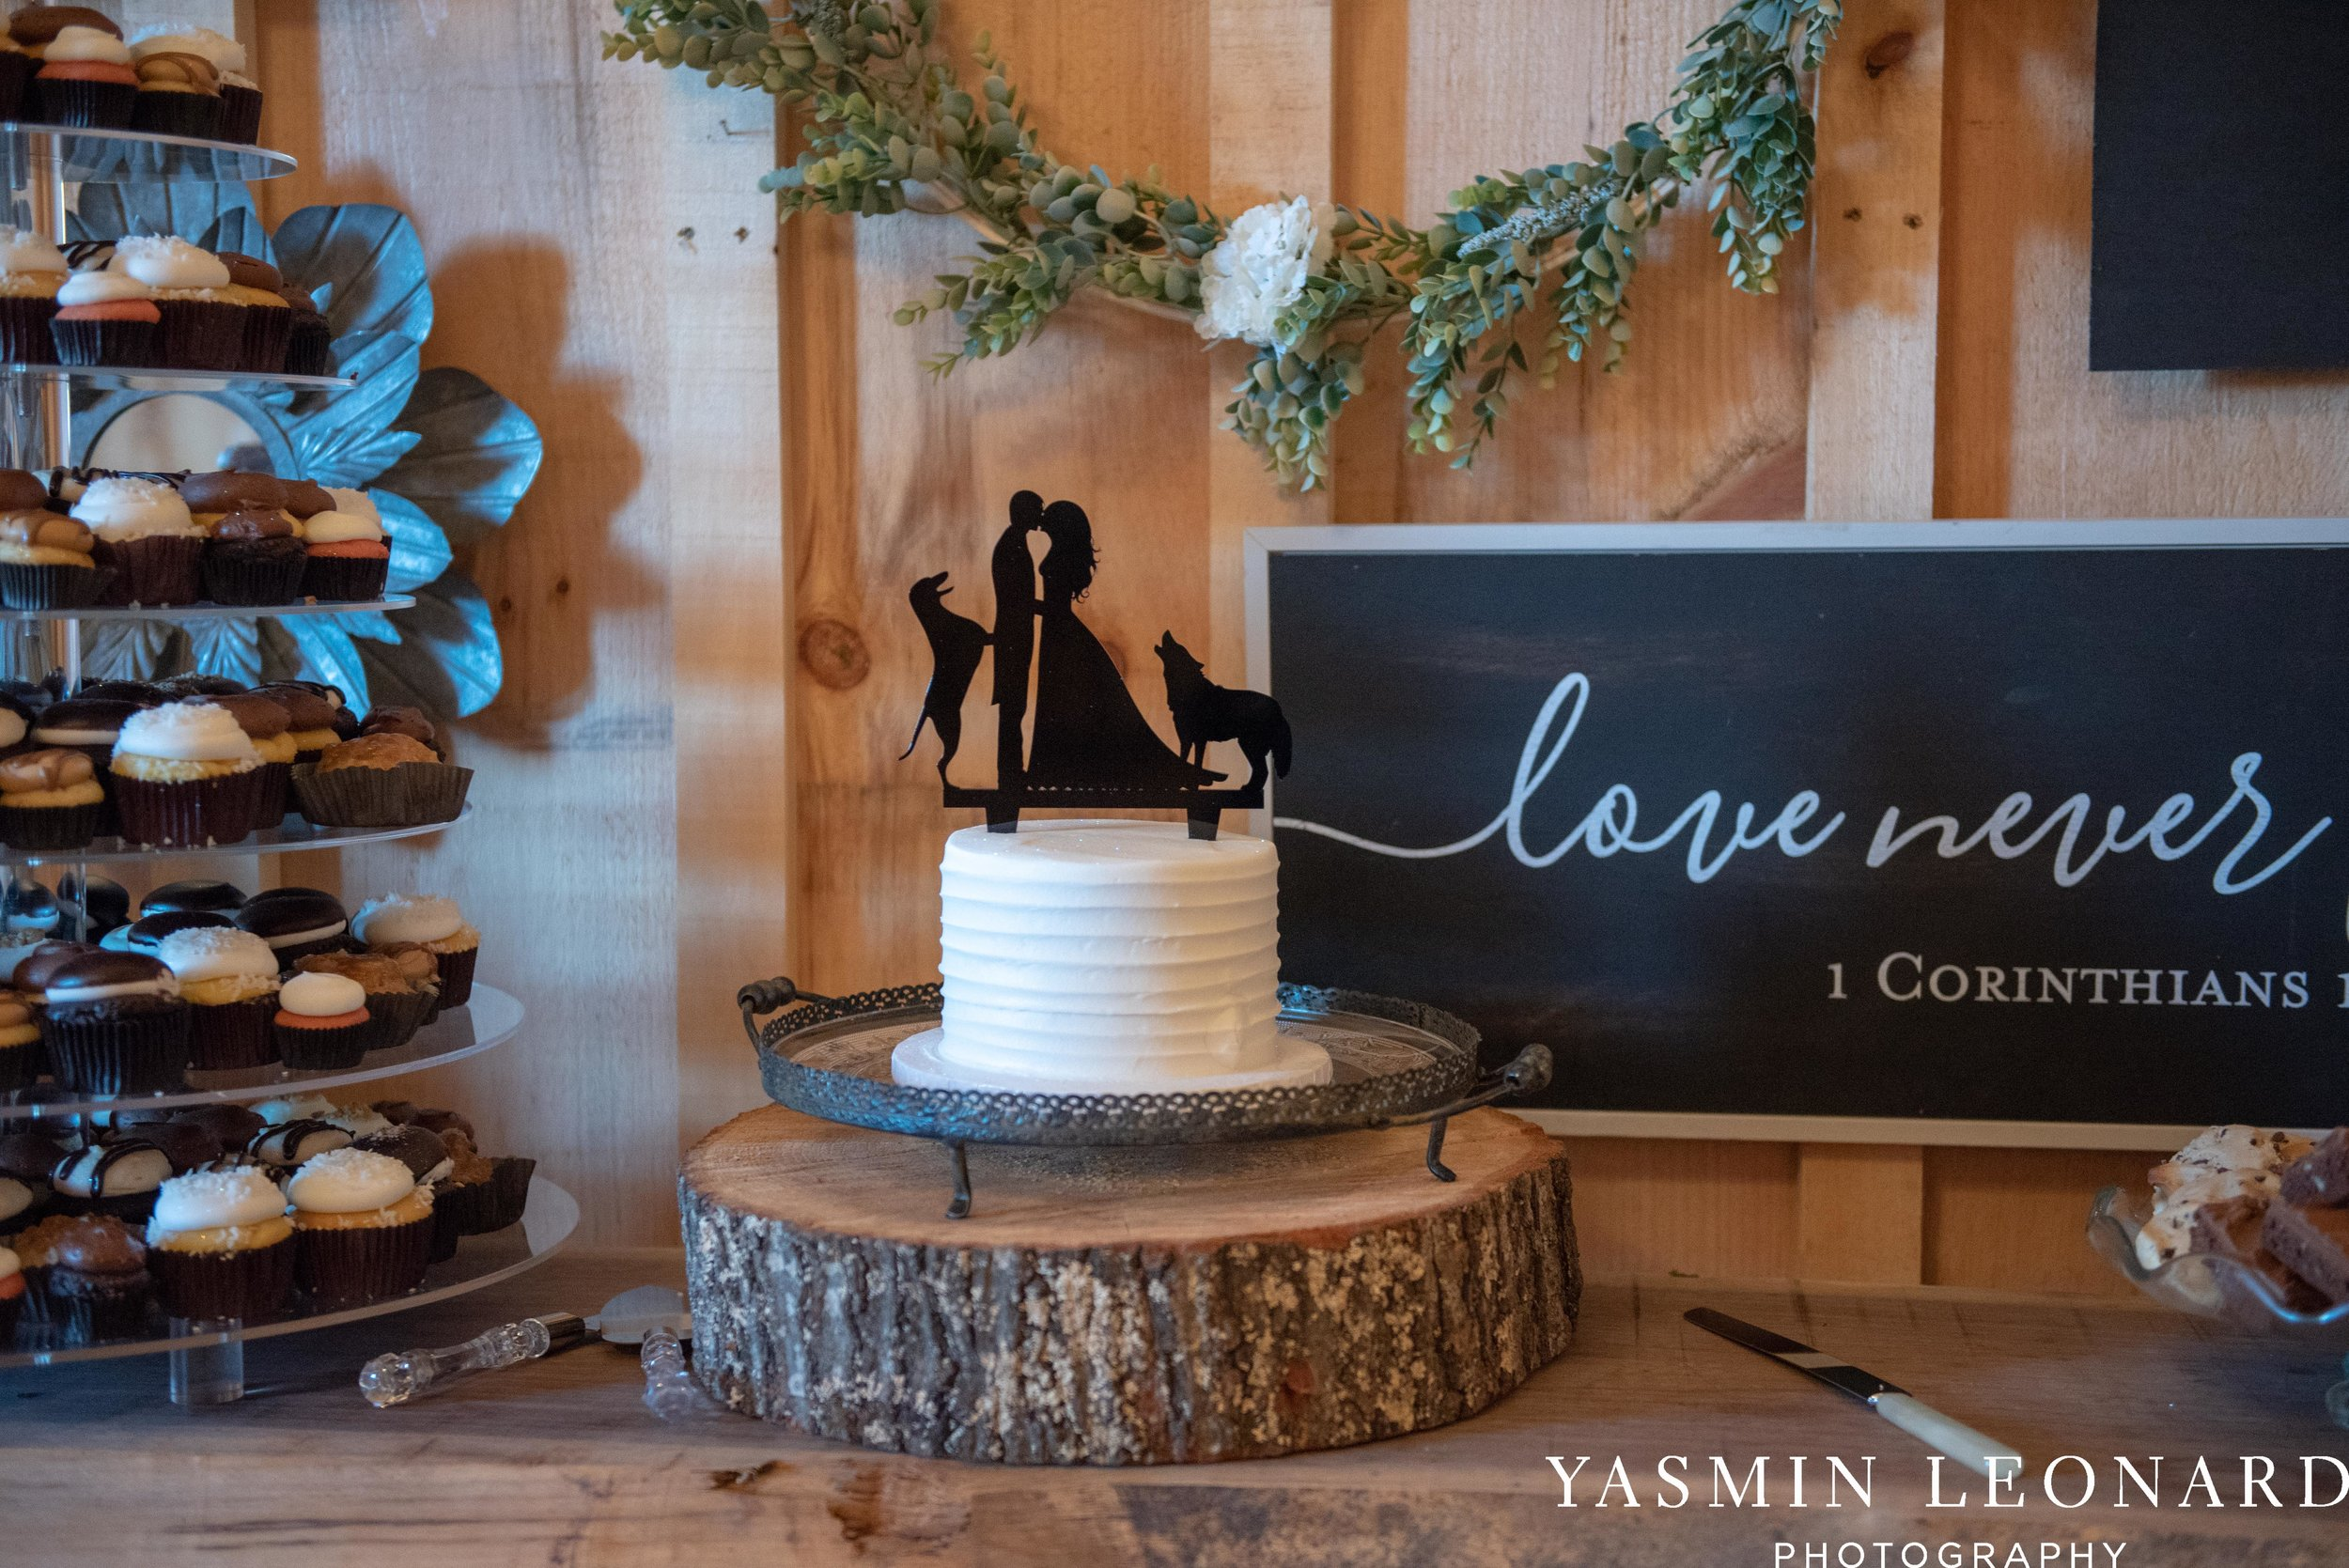 Wesley Memorial United Methodist Church - Old Homeplace Winery - High Point Weddings - High Point Wedding Photographer - NC Weddings - NC Barn Venue - Yasmin Leonard Photography-50.jpg